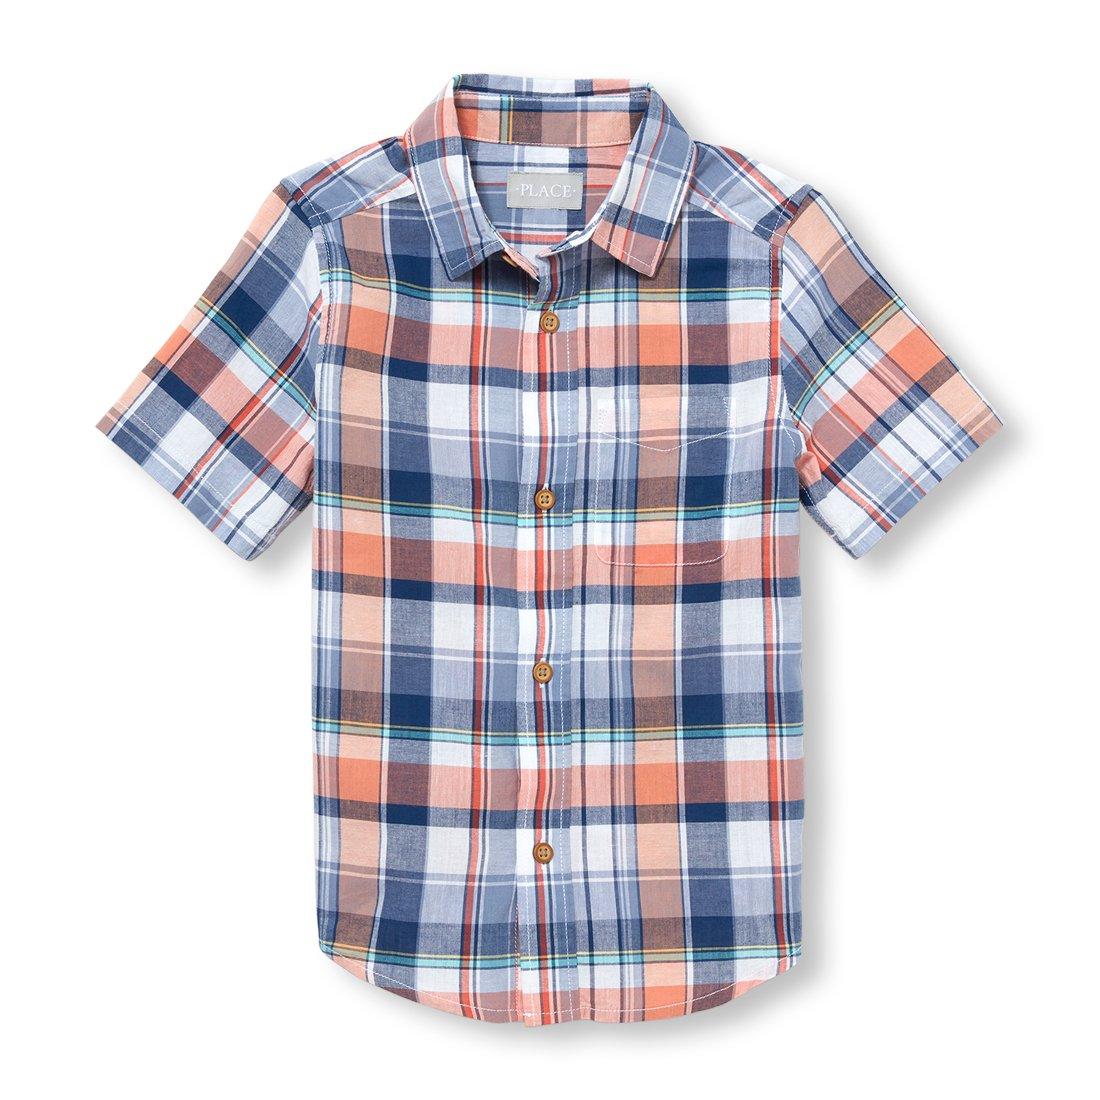 The Children's Place Big Boys' Short Sleeve Button-up Shirt, Jamaican Sunrise 98058, M (7/8)